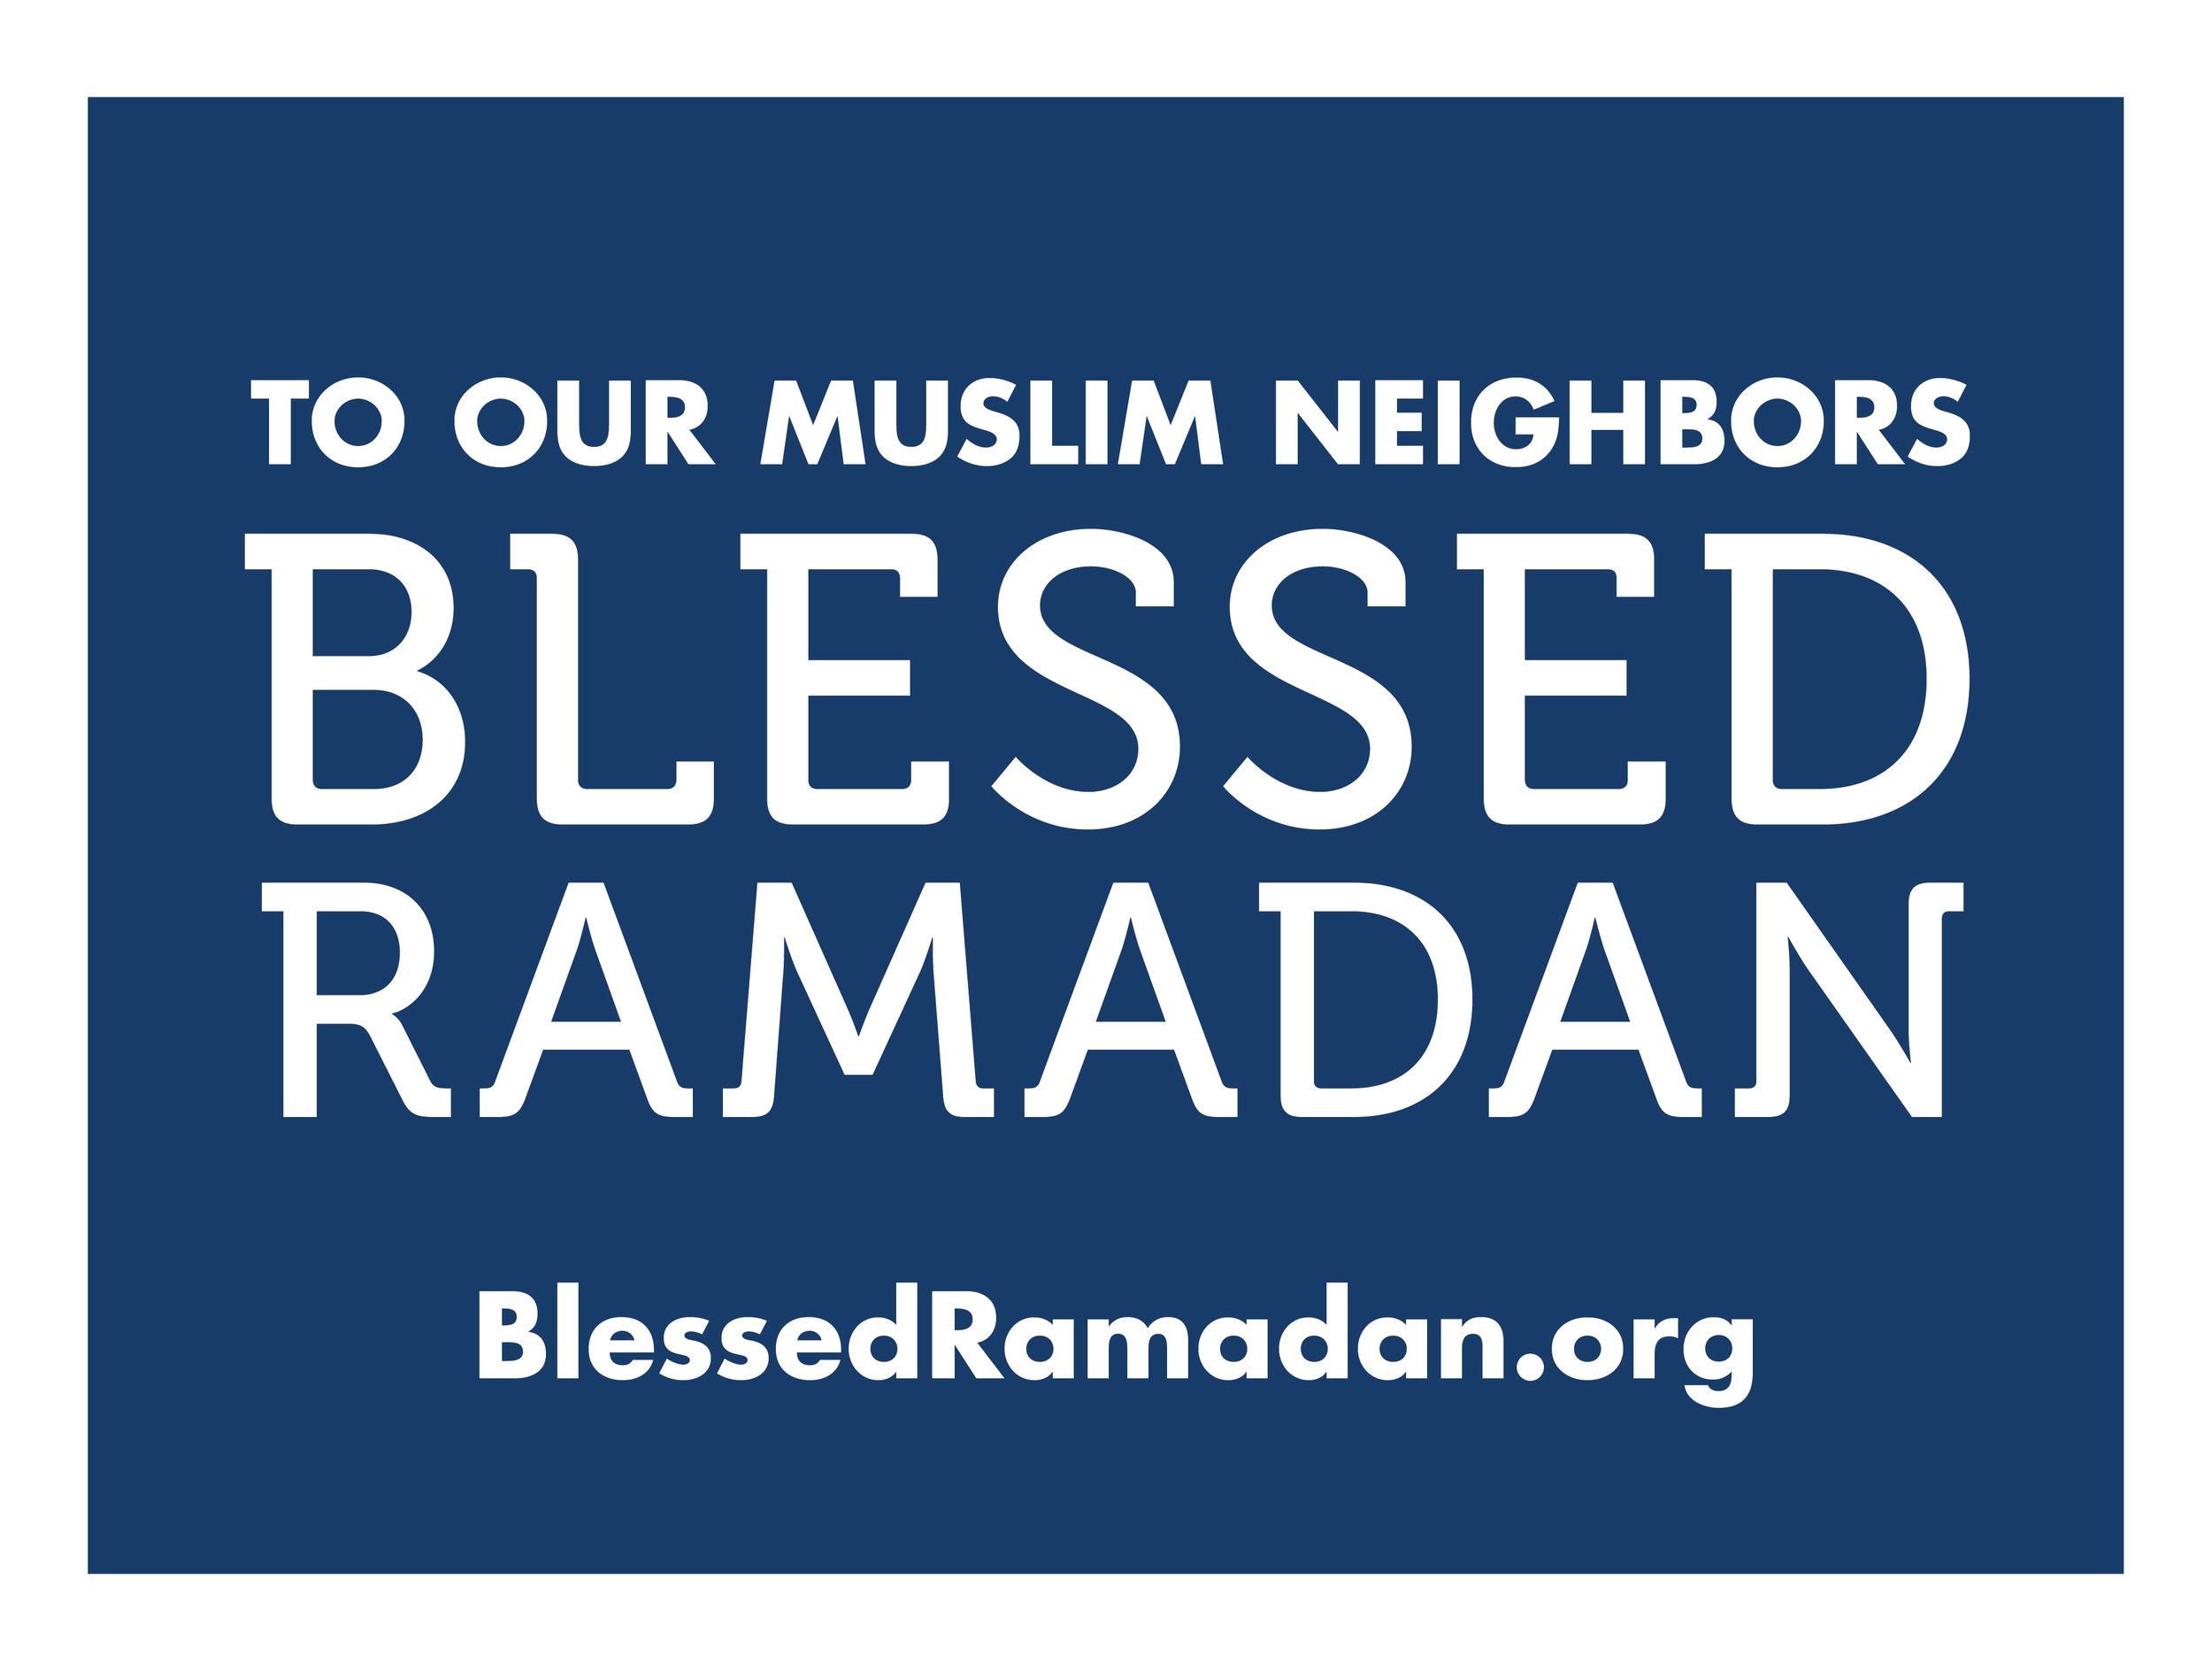 Blessed-Ramadan-MN